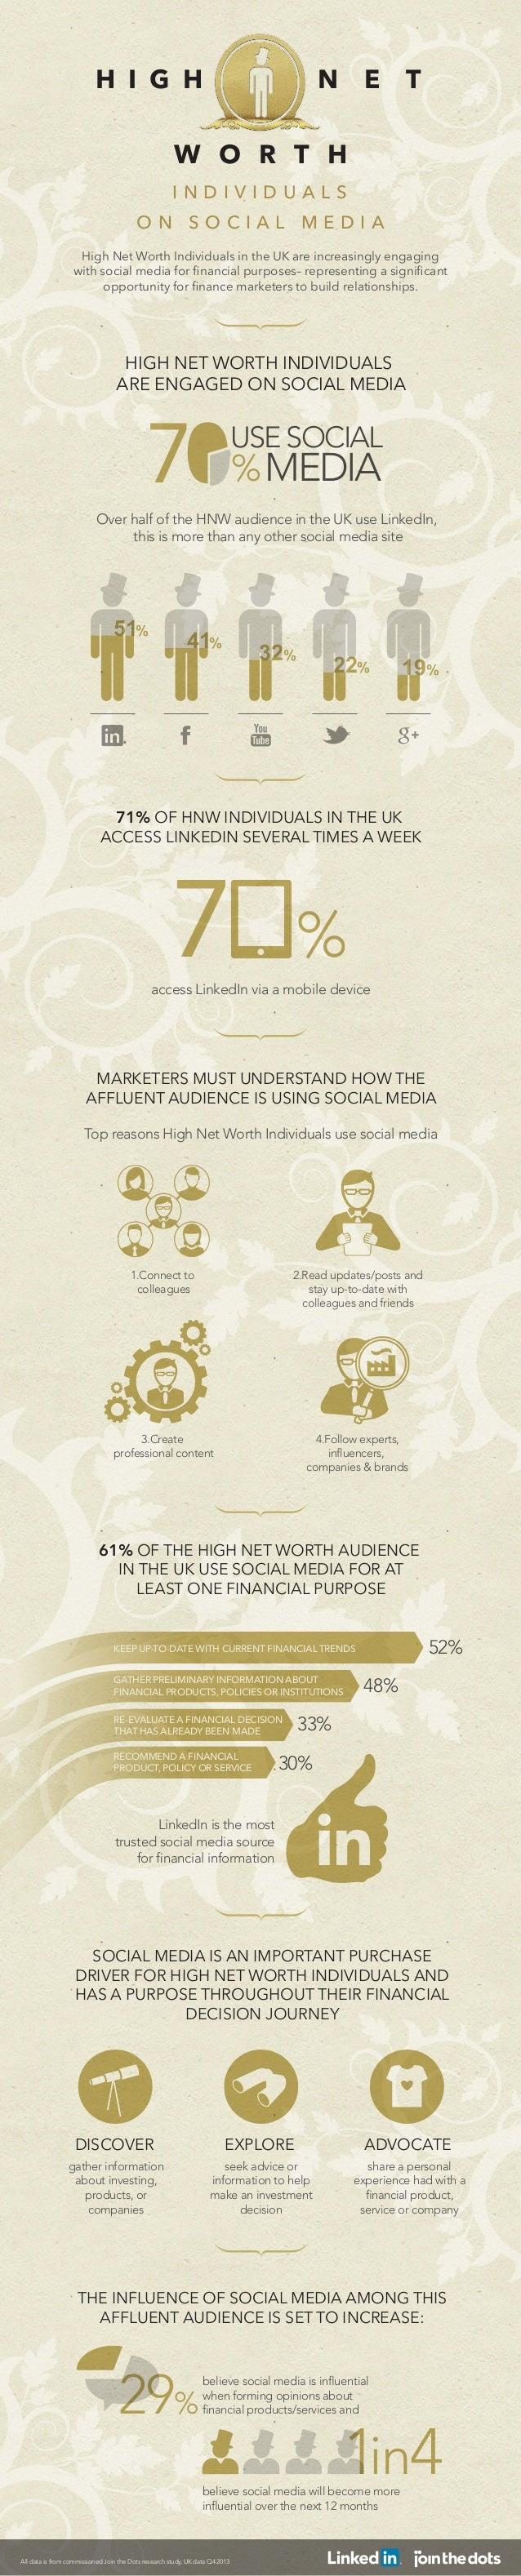 High Net Worth UK Audience on Social Media